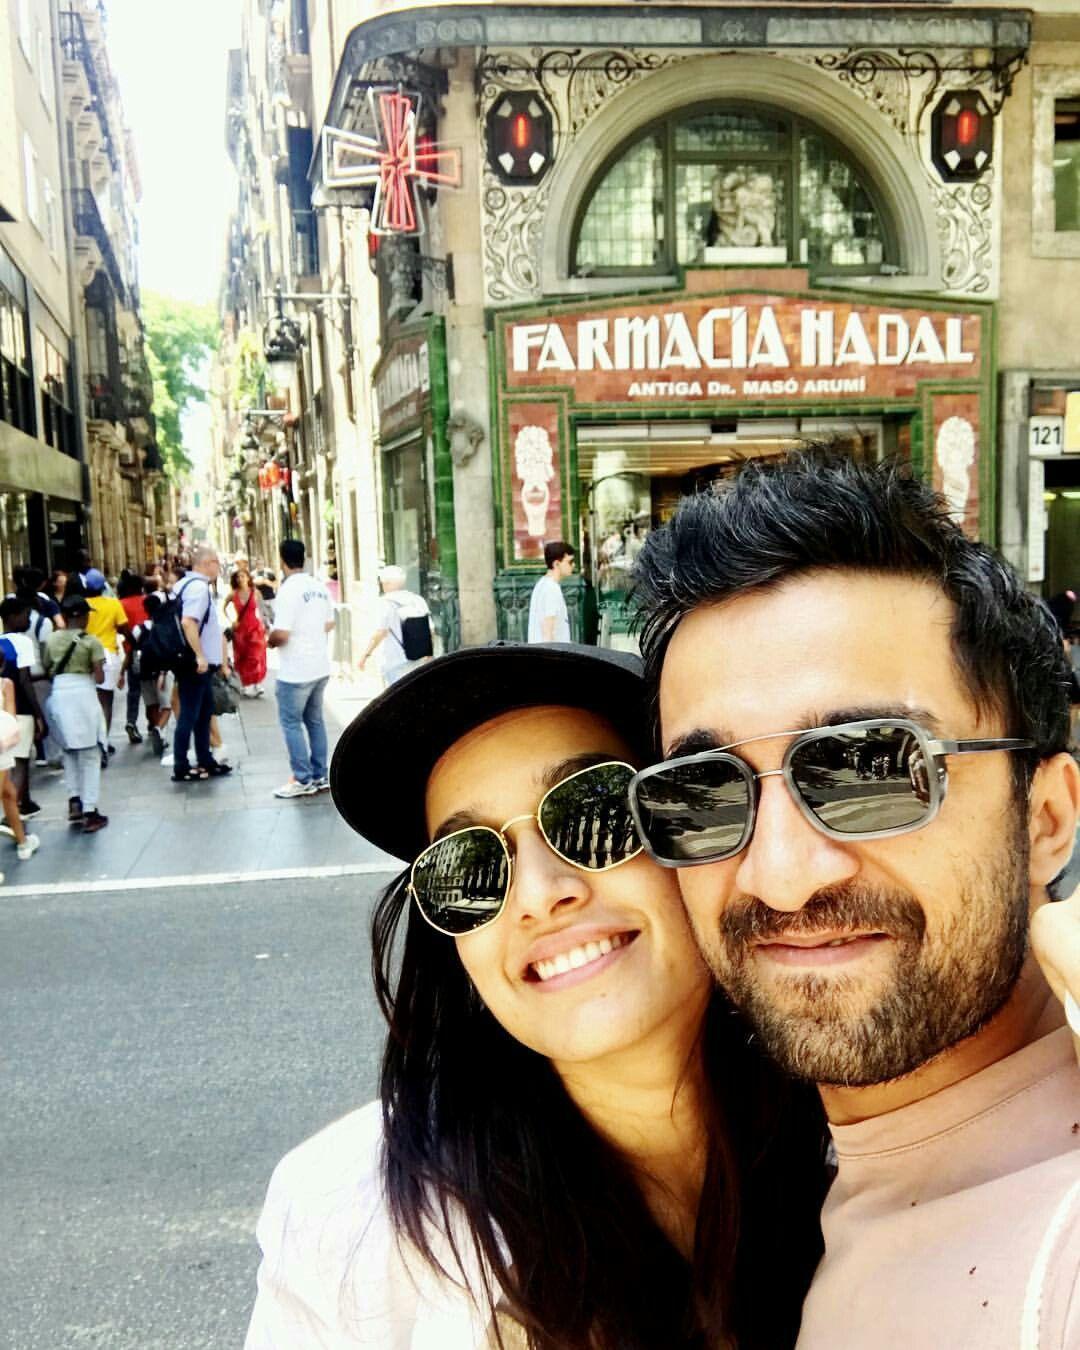 150718 Shraddha Kapoor Off For A Vacation Shraddha Kapoor Shraddha Kapoor Instagram Bollywood Couples